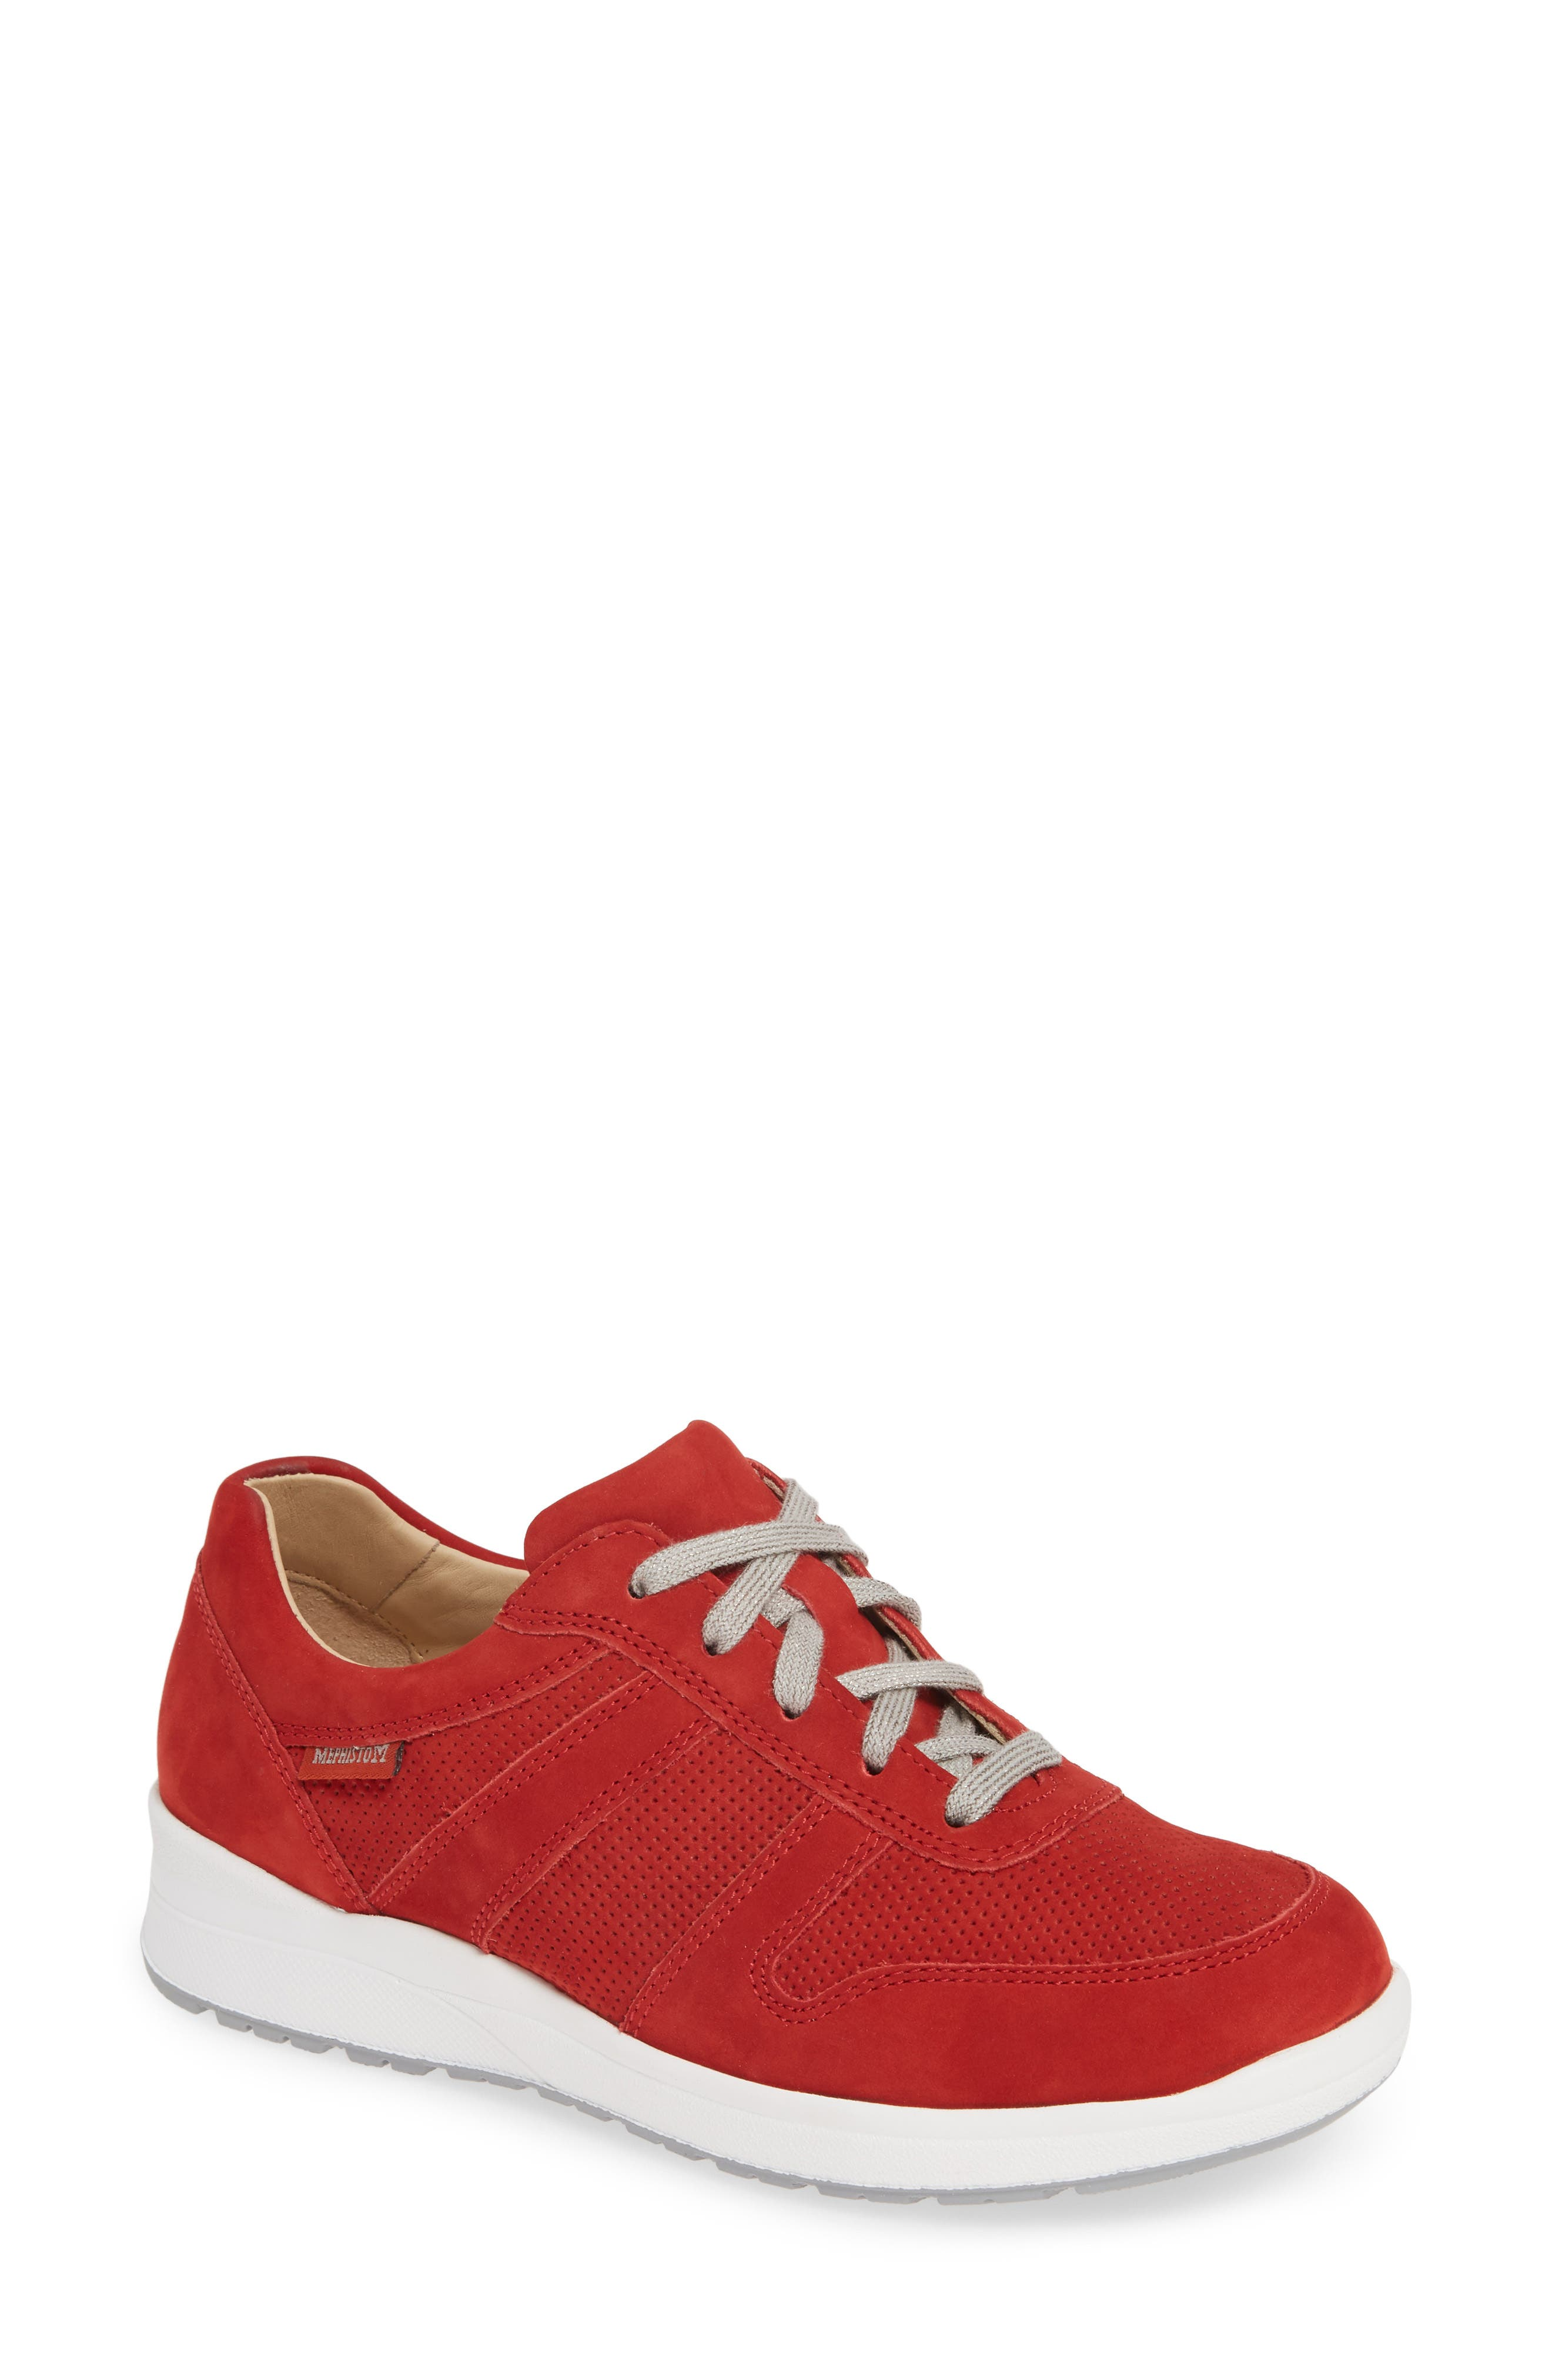 Rebecca Perforated Sneaker